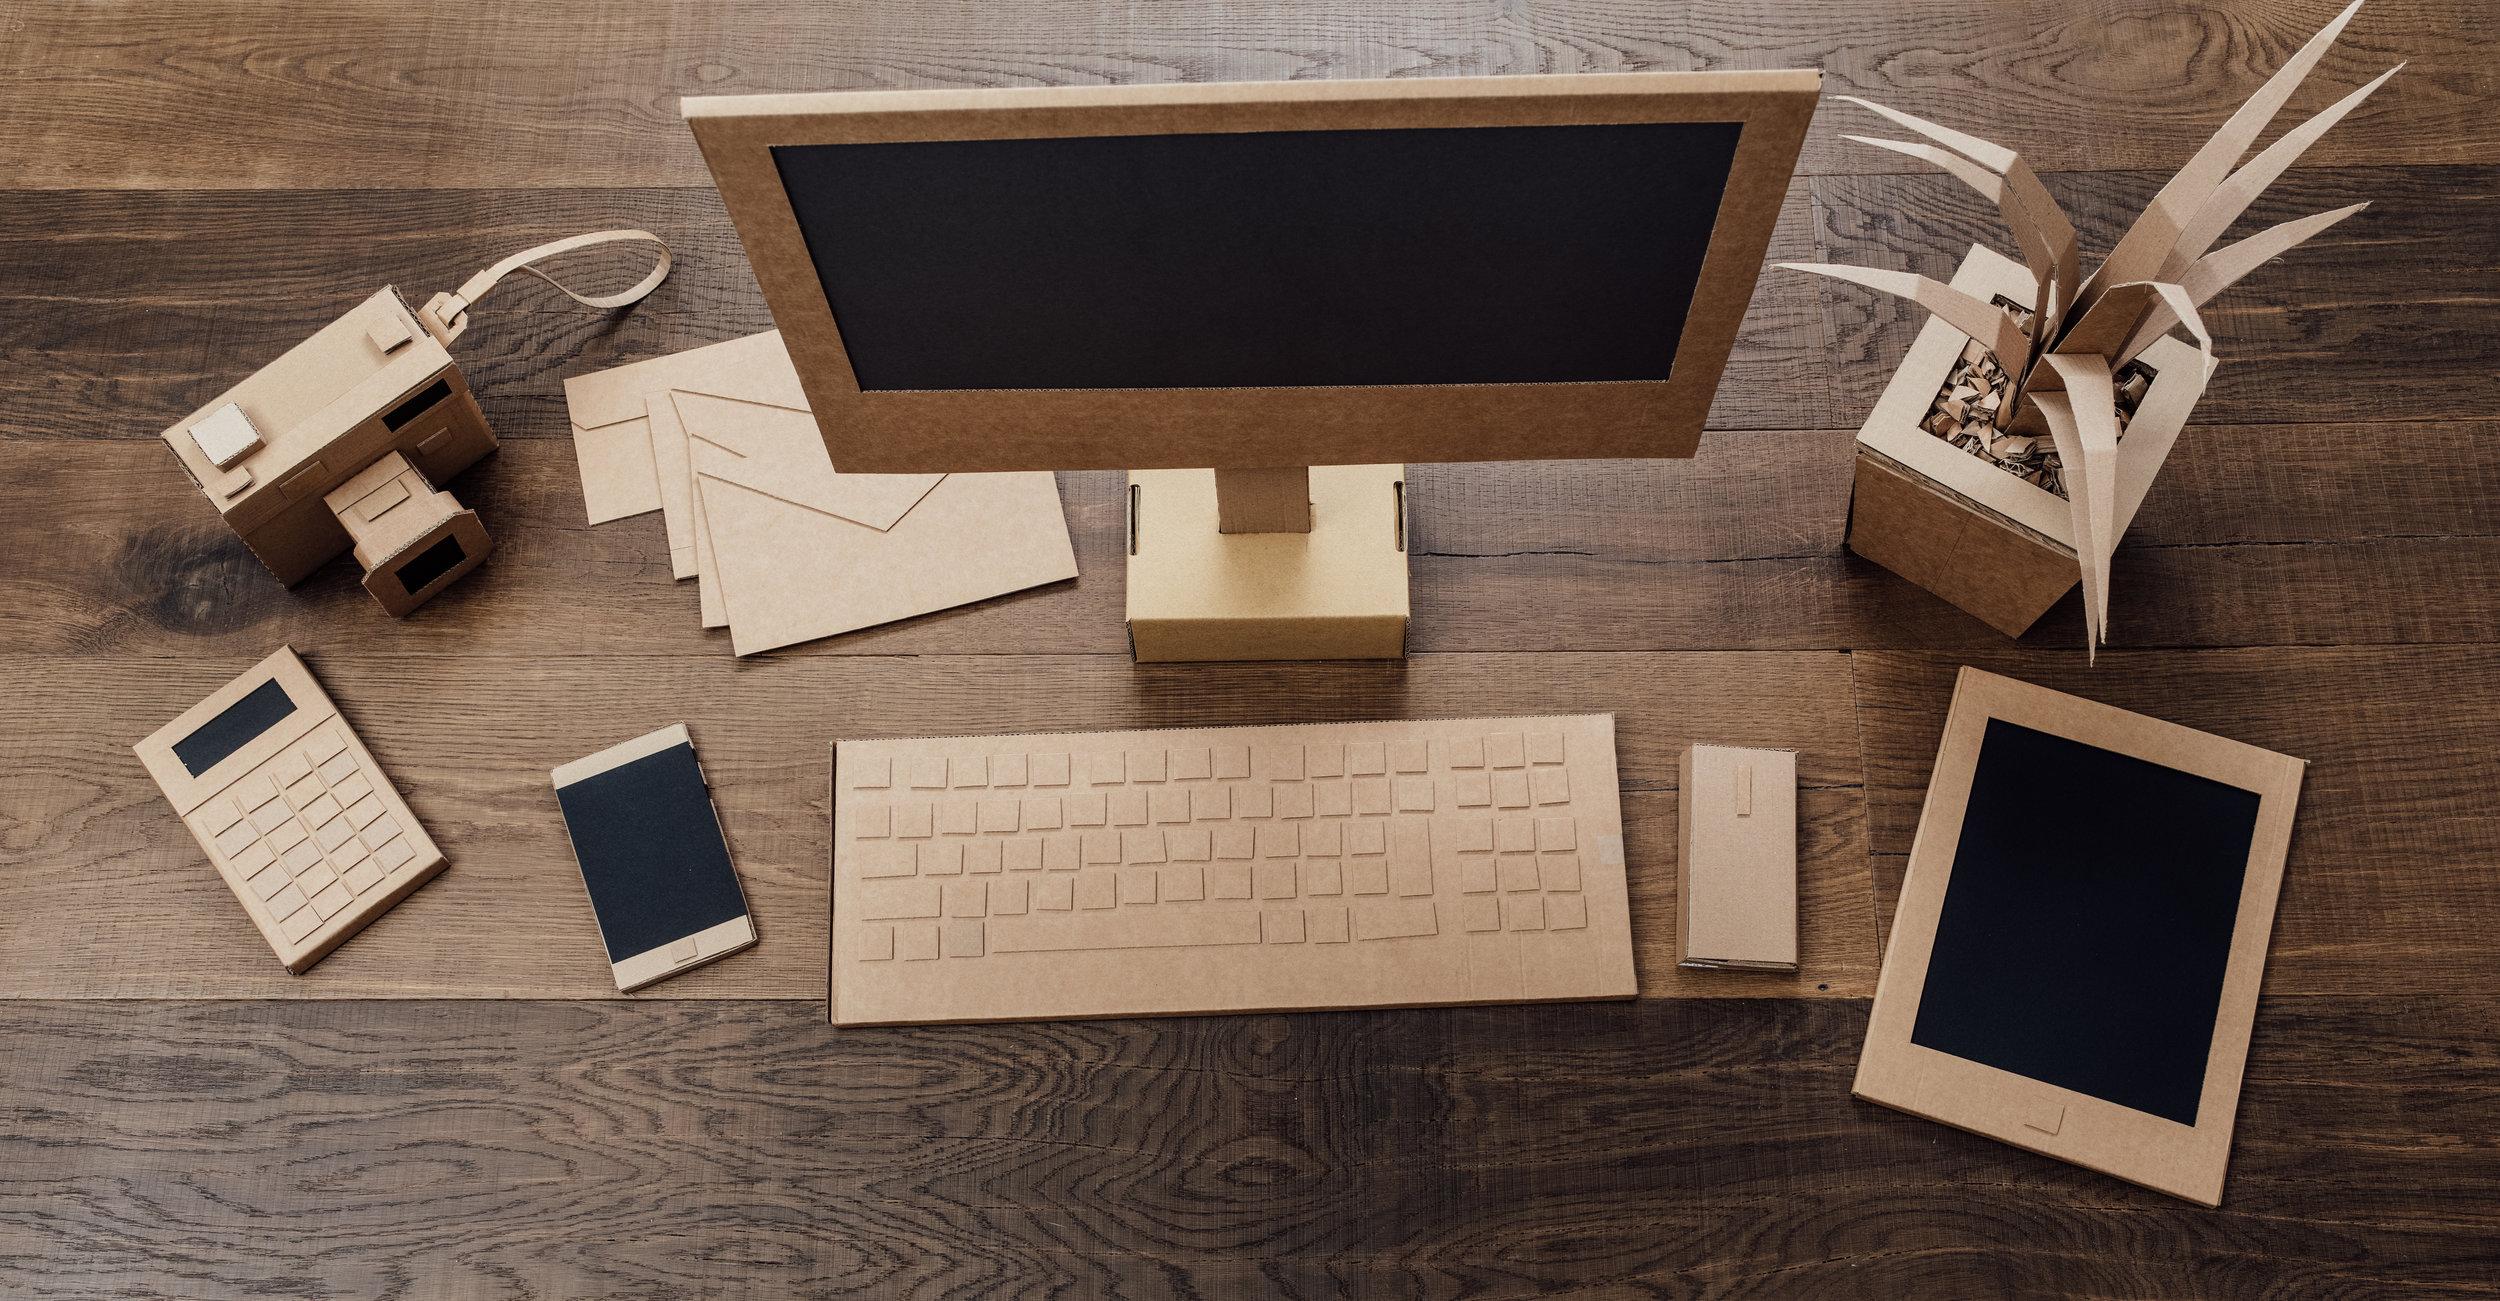 Creative eco friendly cardboard office